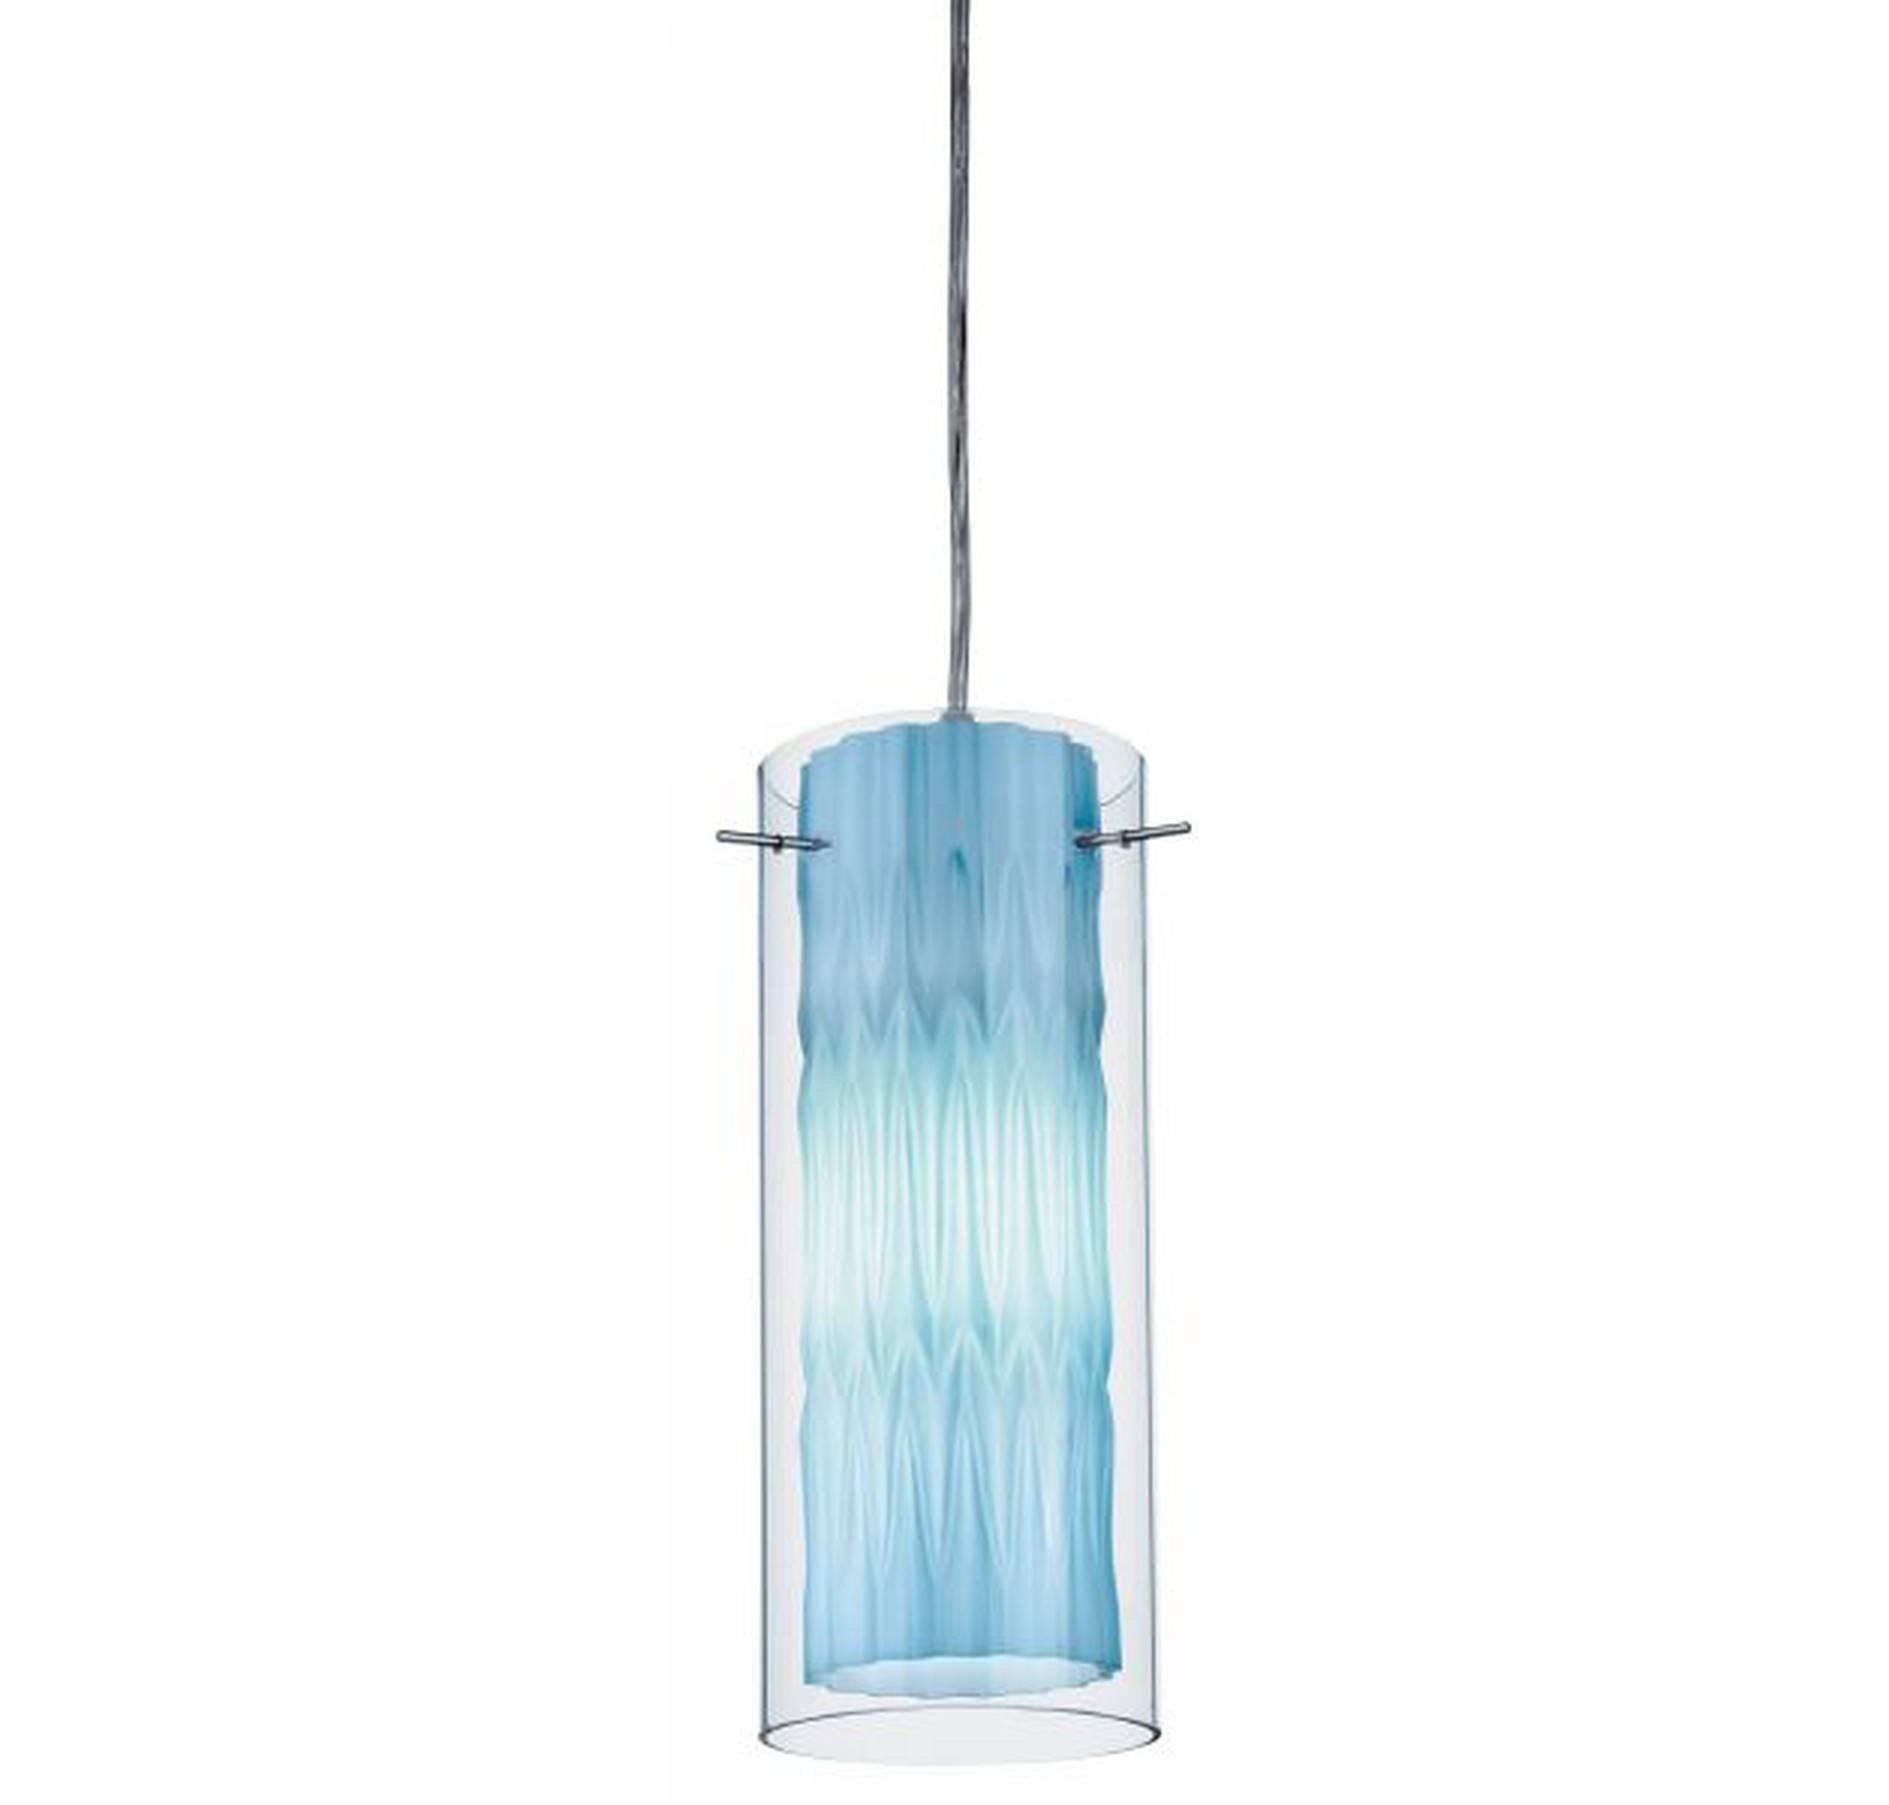 Lighting Design Ideas: Aqua Metal Blue Pendant Light Glass Shades regarding Aqua Pendant Lights Fixtures (Image 8 of 15)